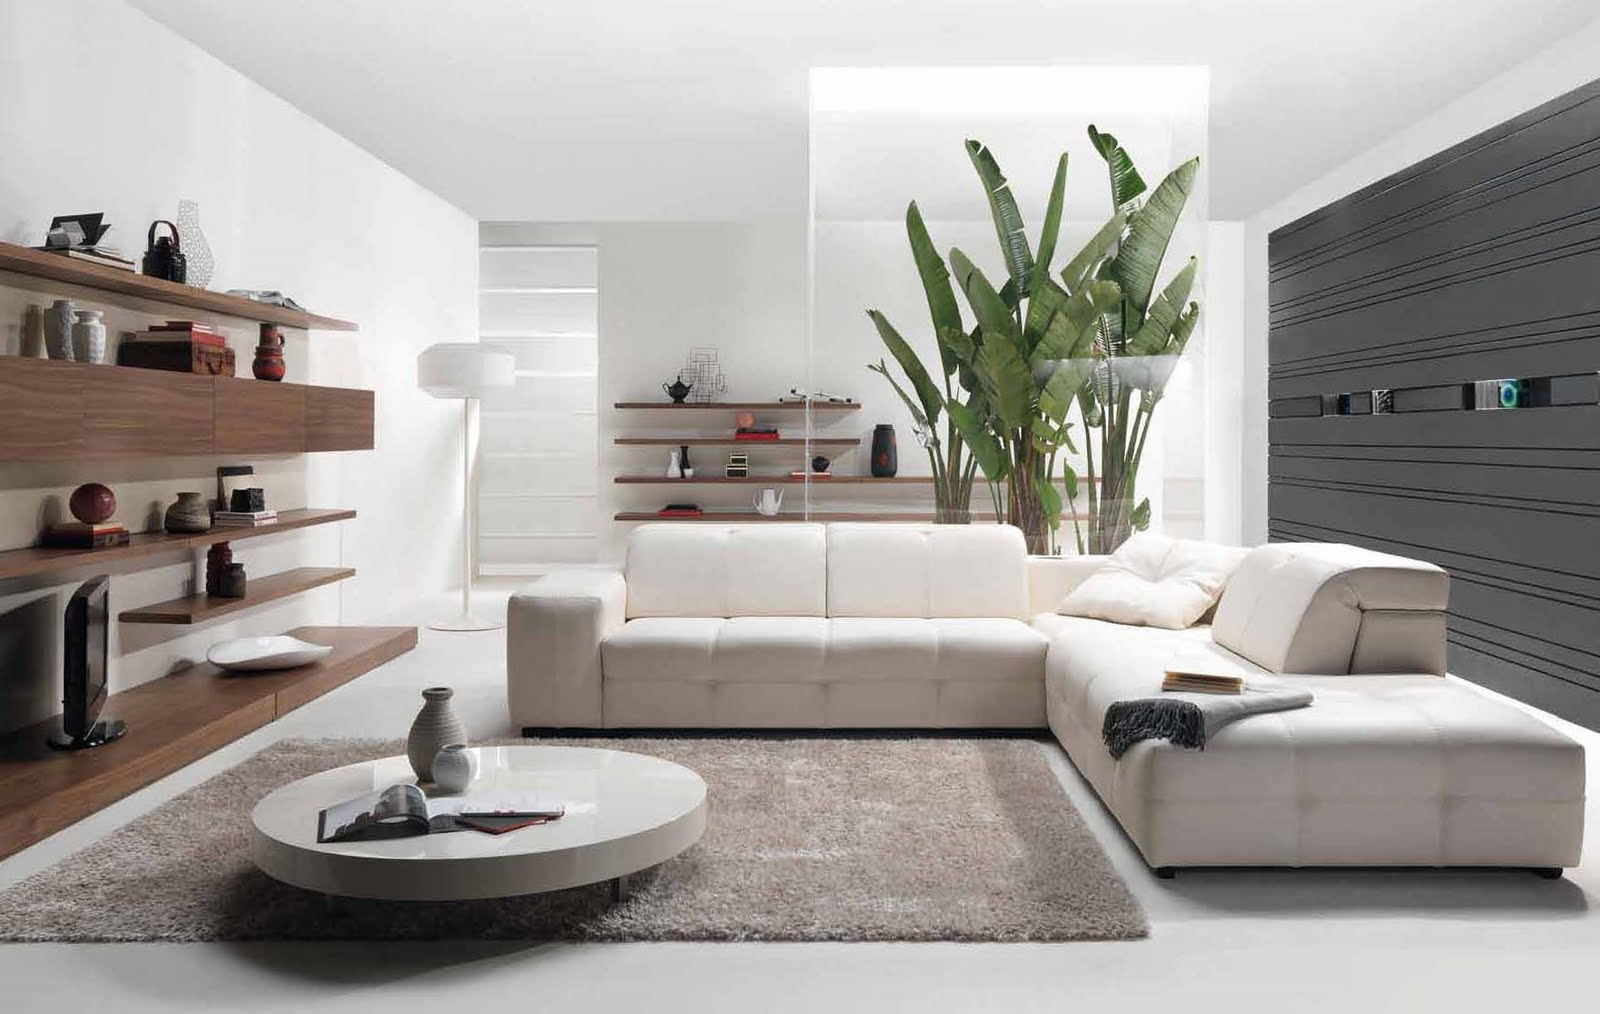 Future House Design: Modern Living Room Interior Design Styles 2010 by Natuzzi